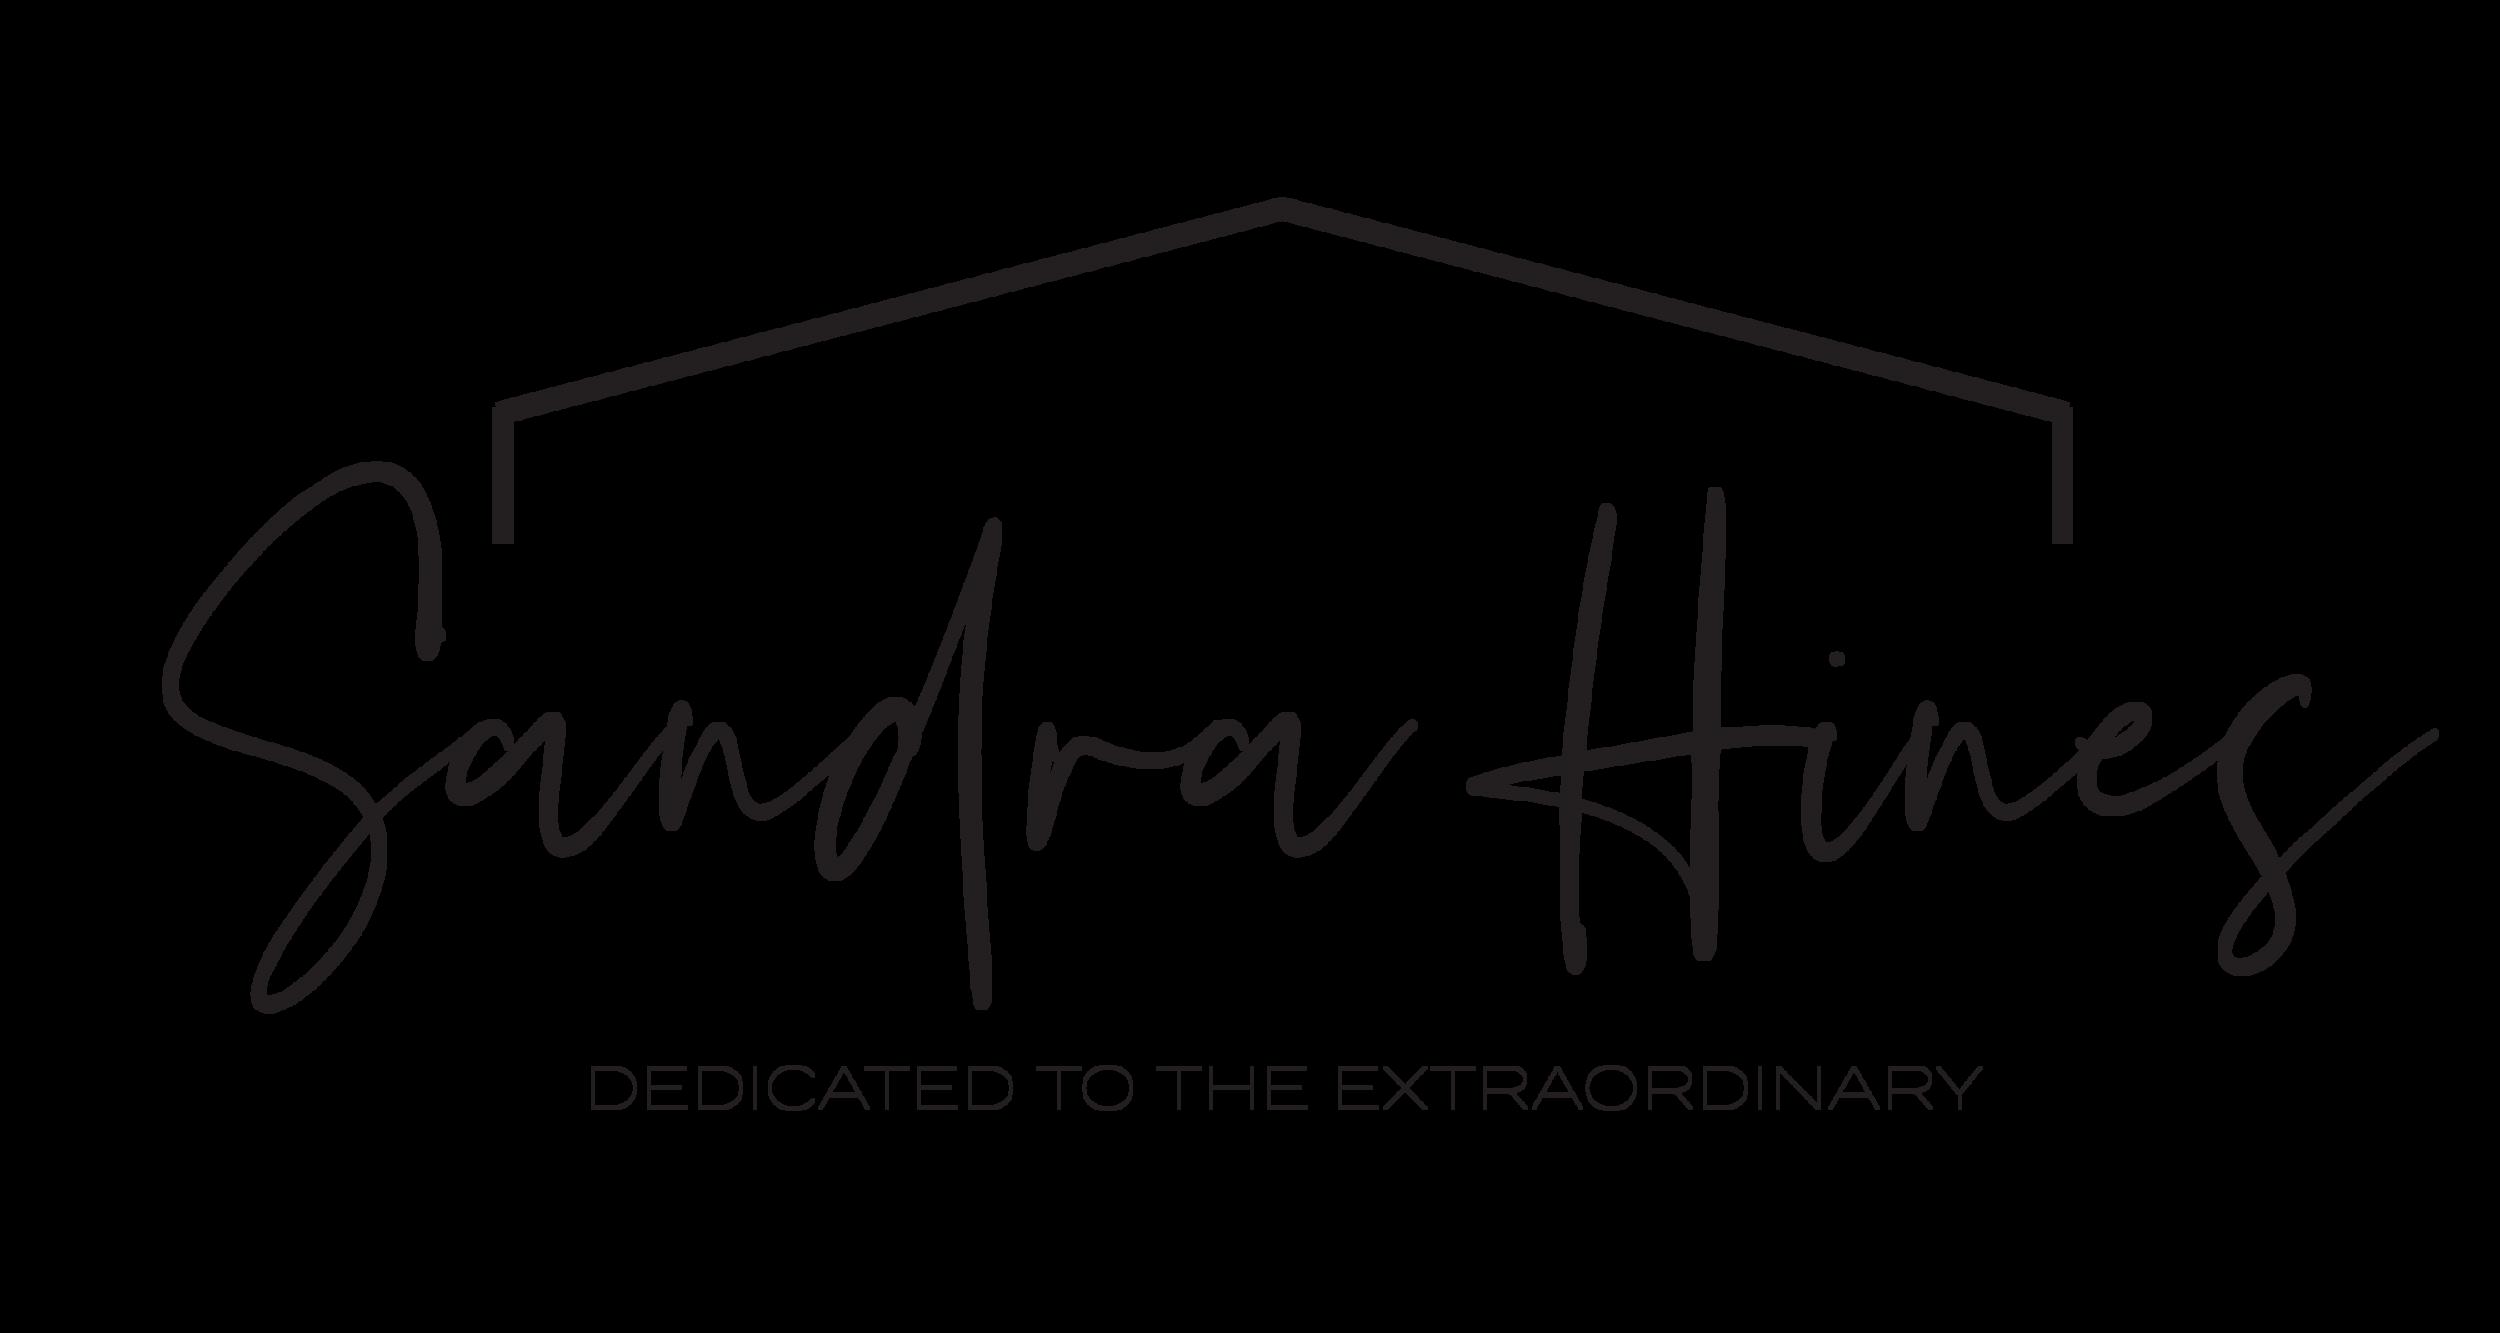 Sandra Hines Logo Black.png